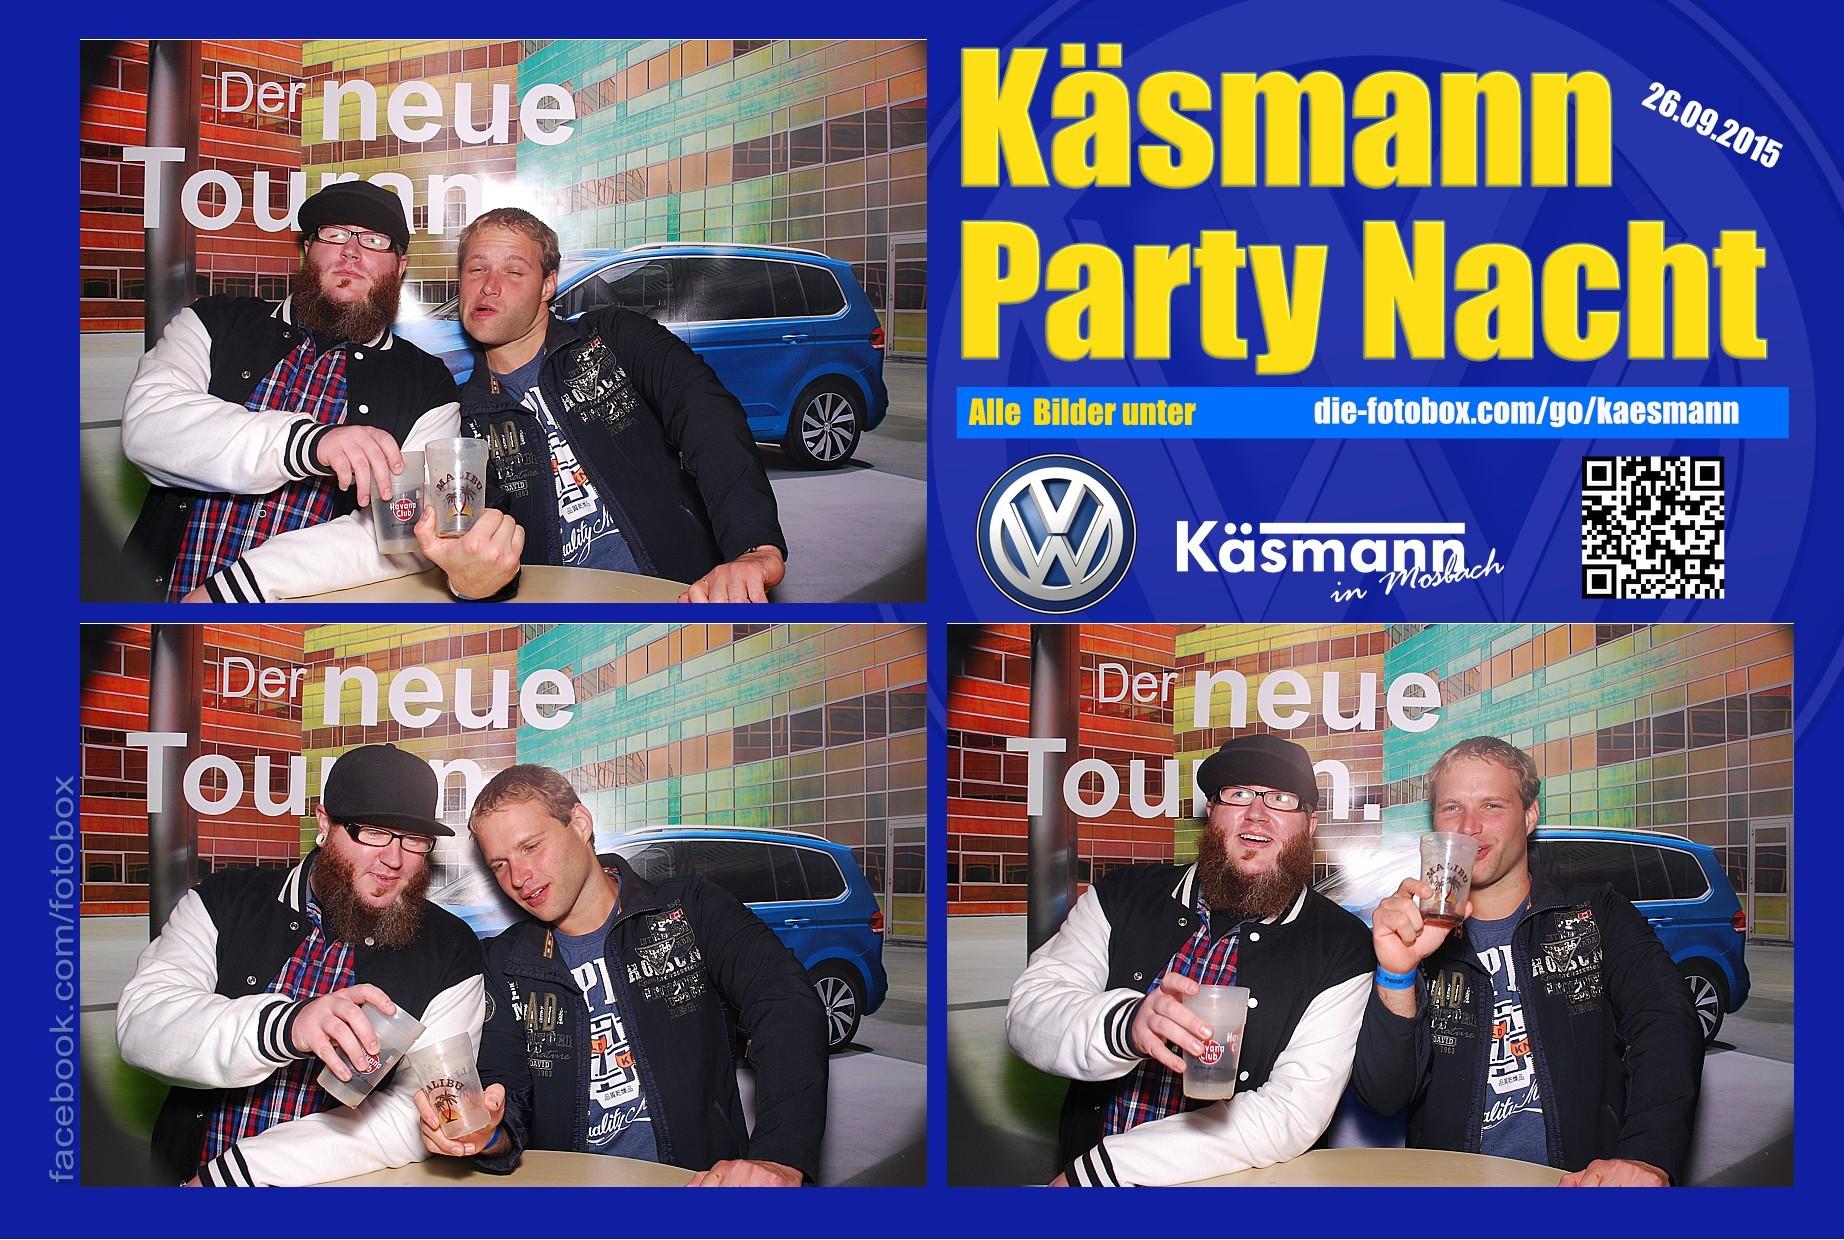 Käsmannparty 2015 - www.die-fotobox.com 01256